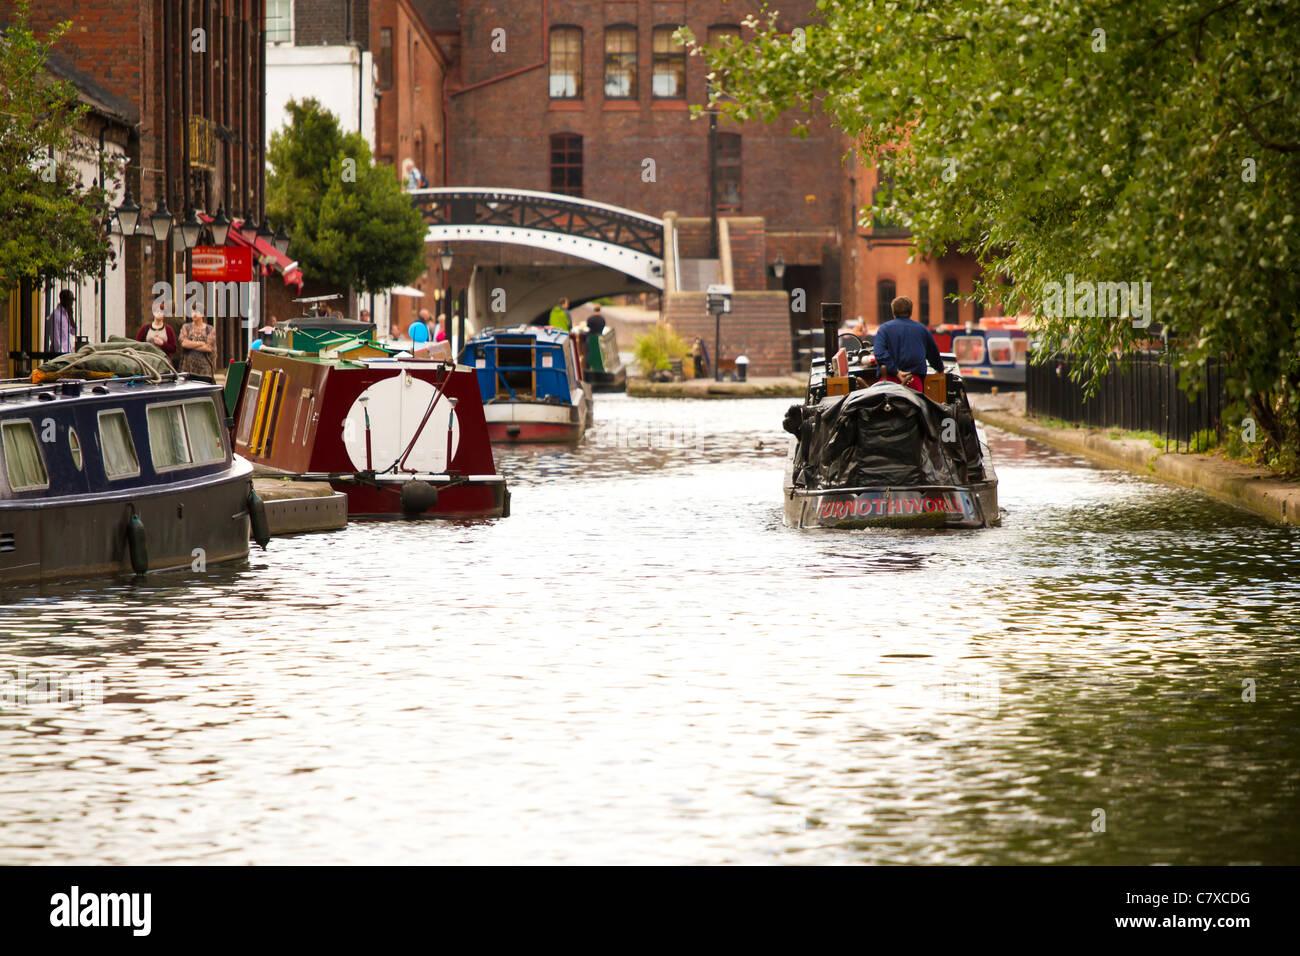 Barge on the canals of Birmingham, West Midlands, England, UK - Stock Image